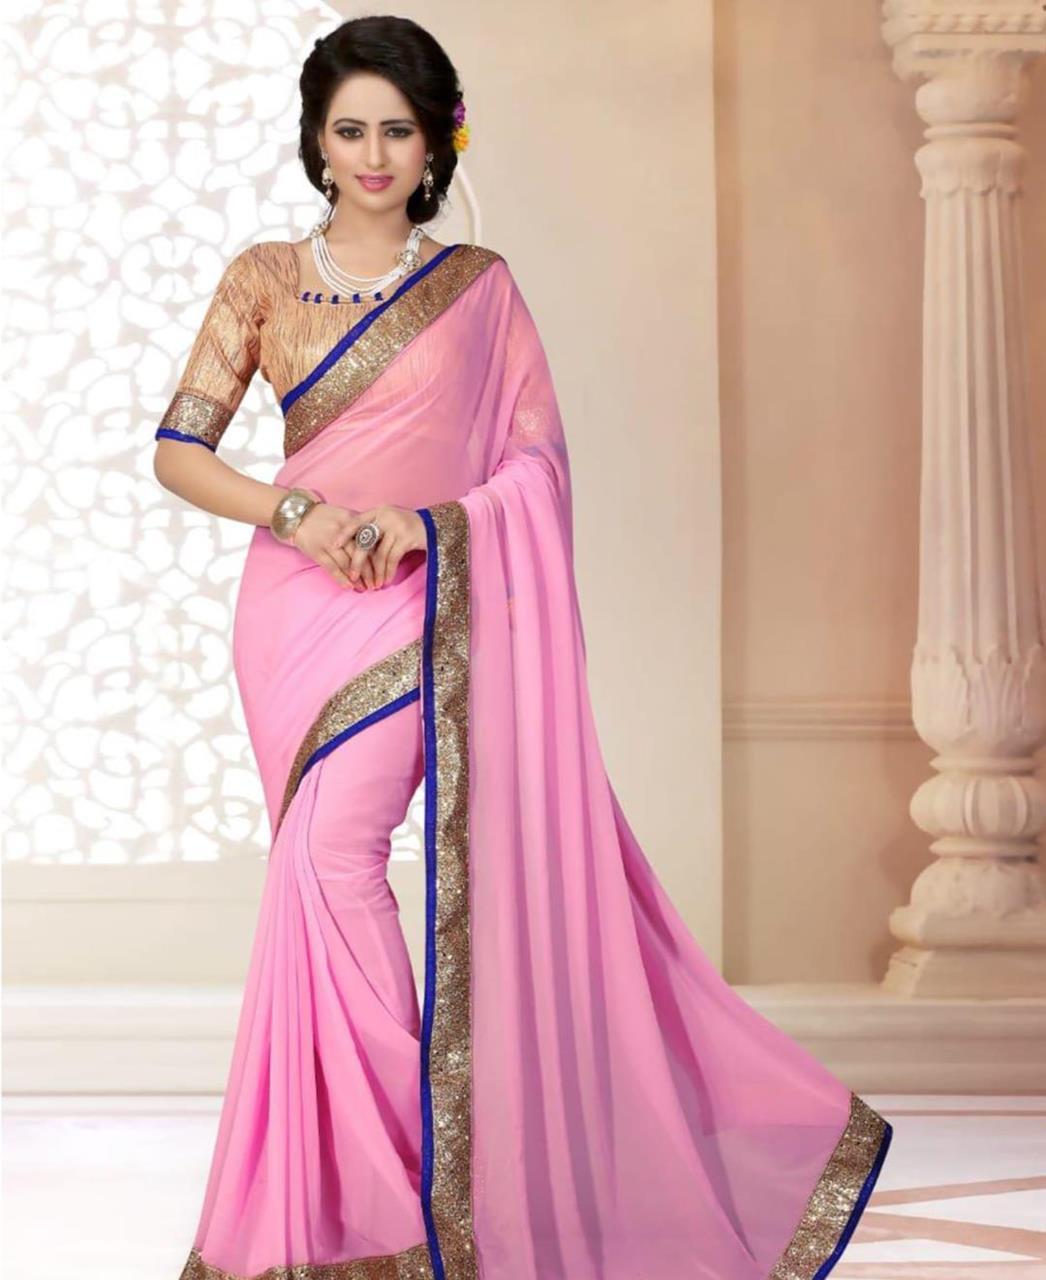 Lace Georgette Saree (Sari) in Pink